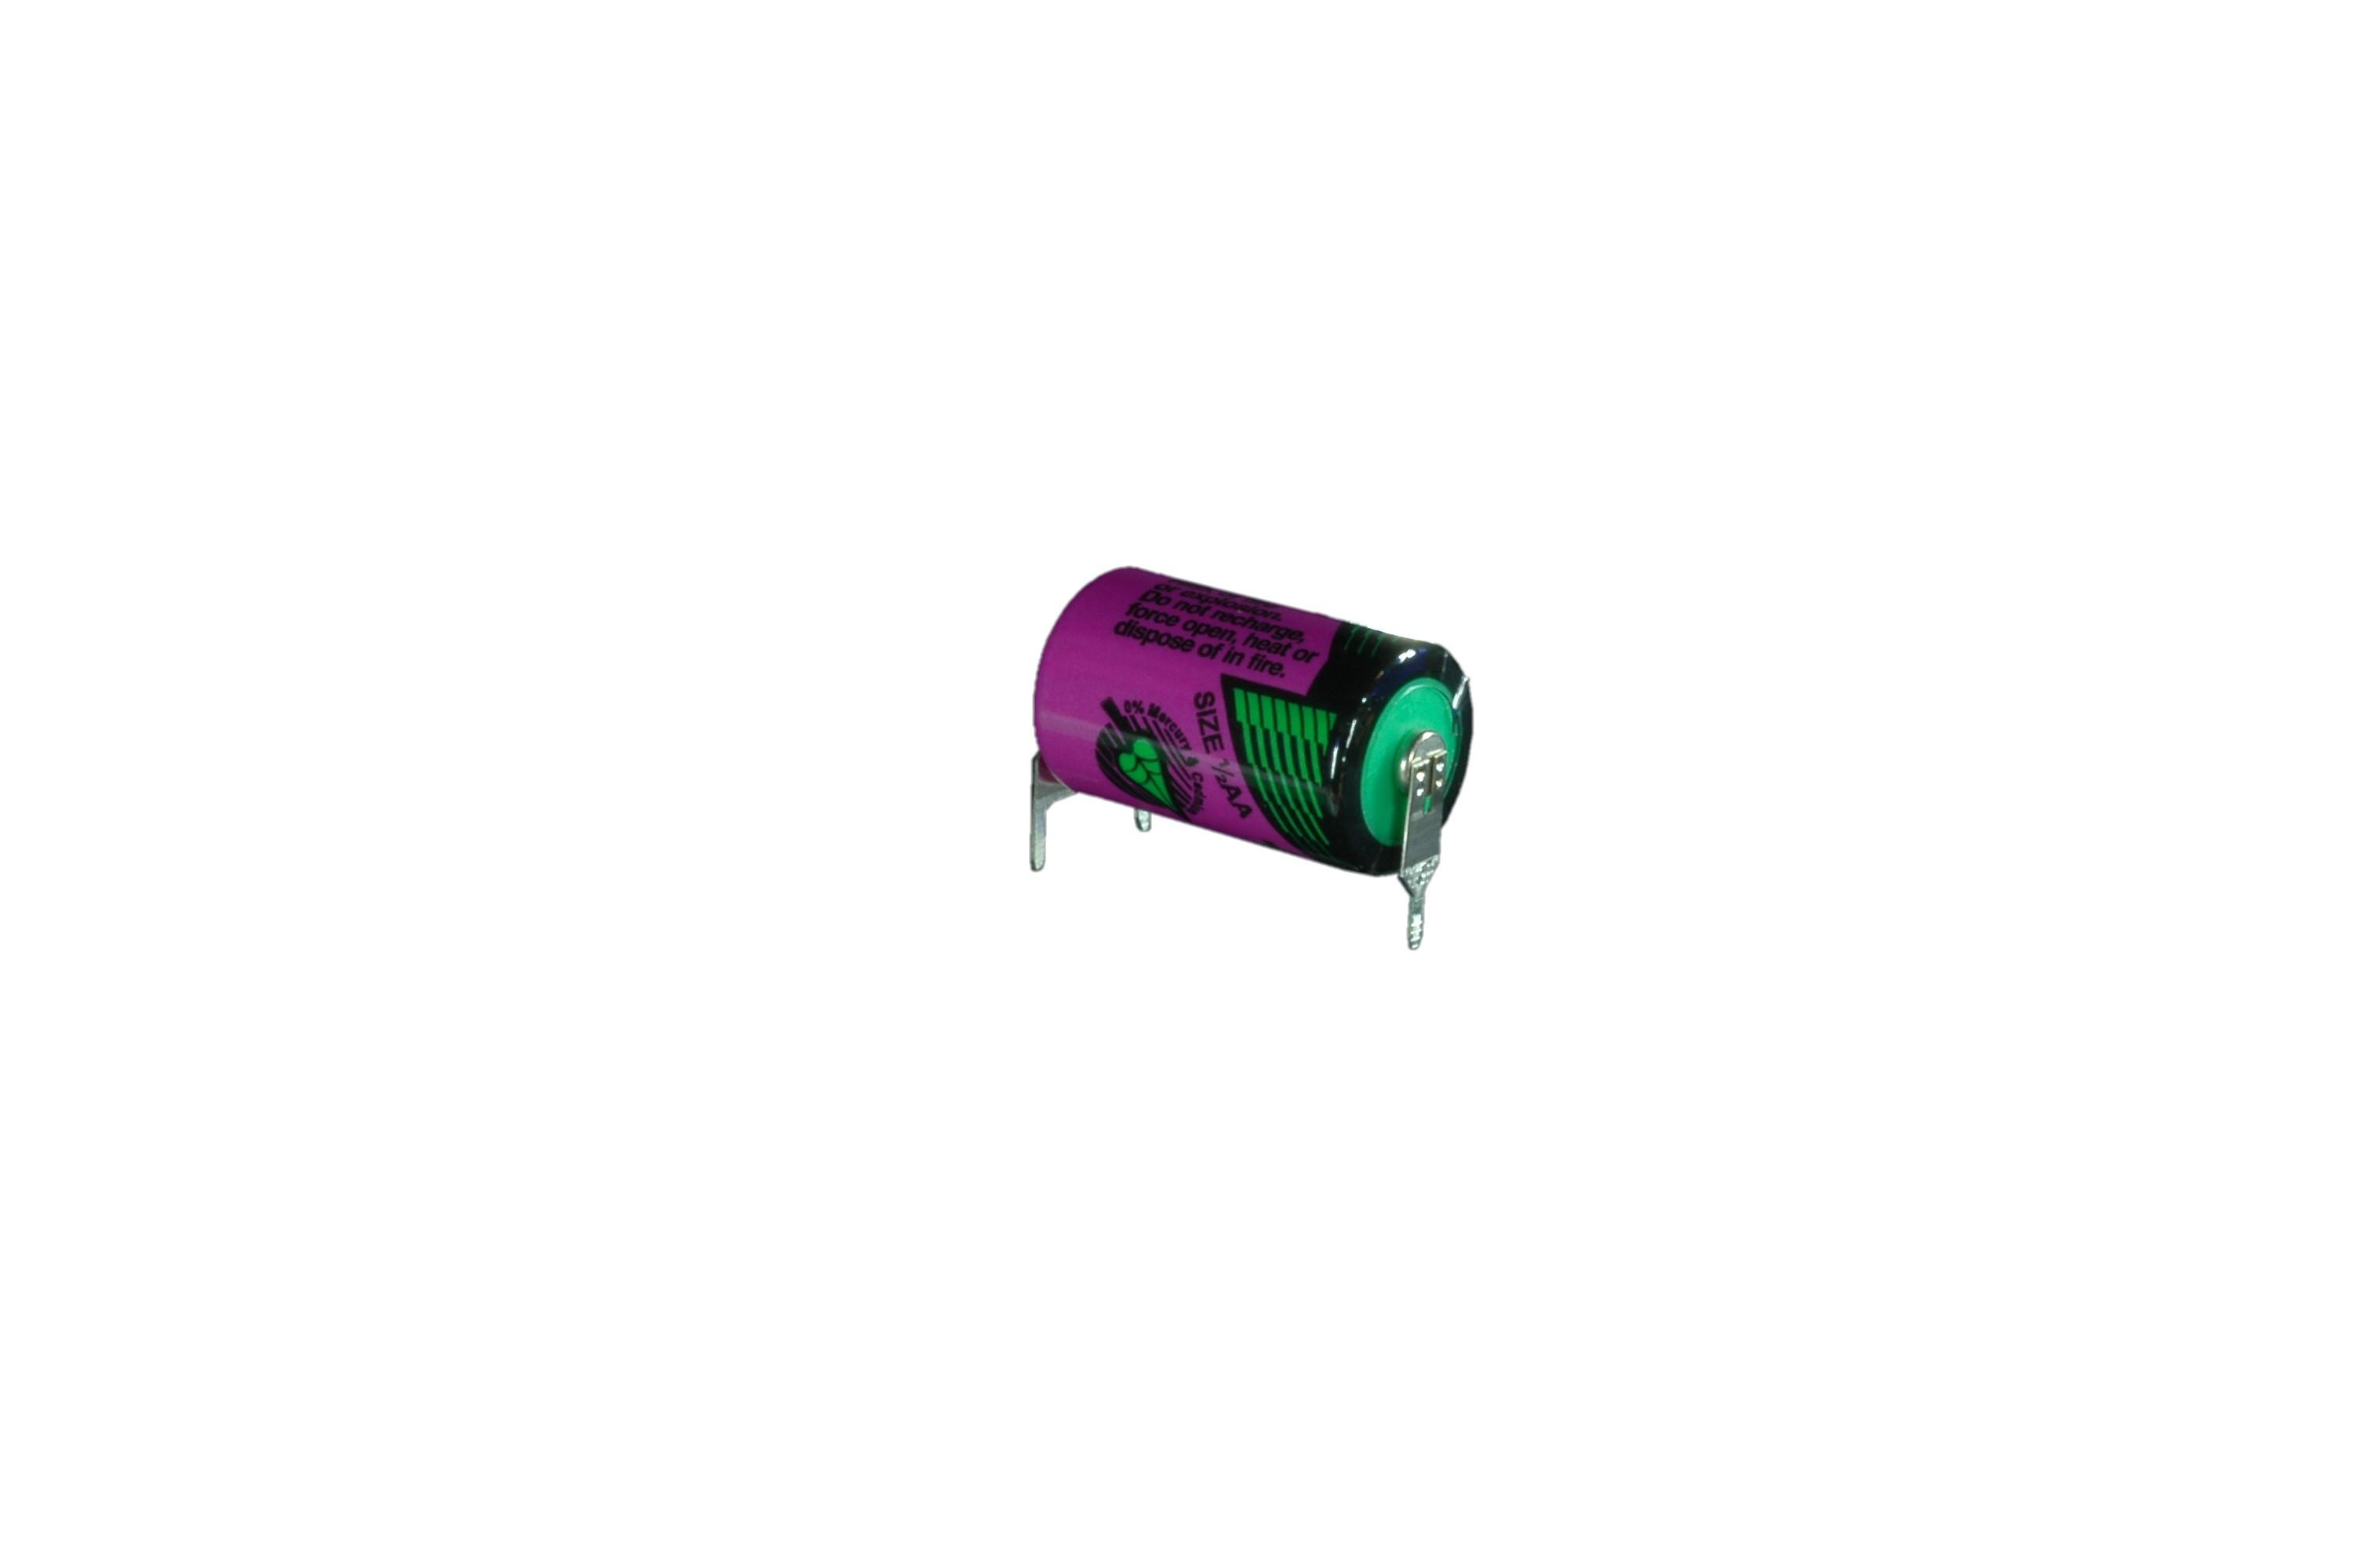 Lithium-Batterie SL-750/PT 1/2AA 3,6V/1,1Ah